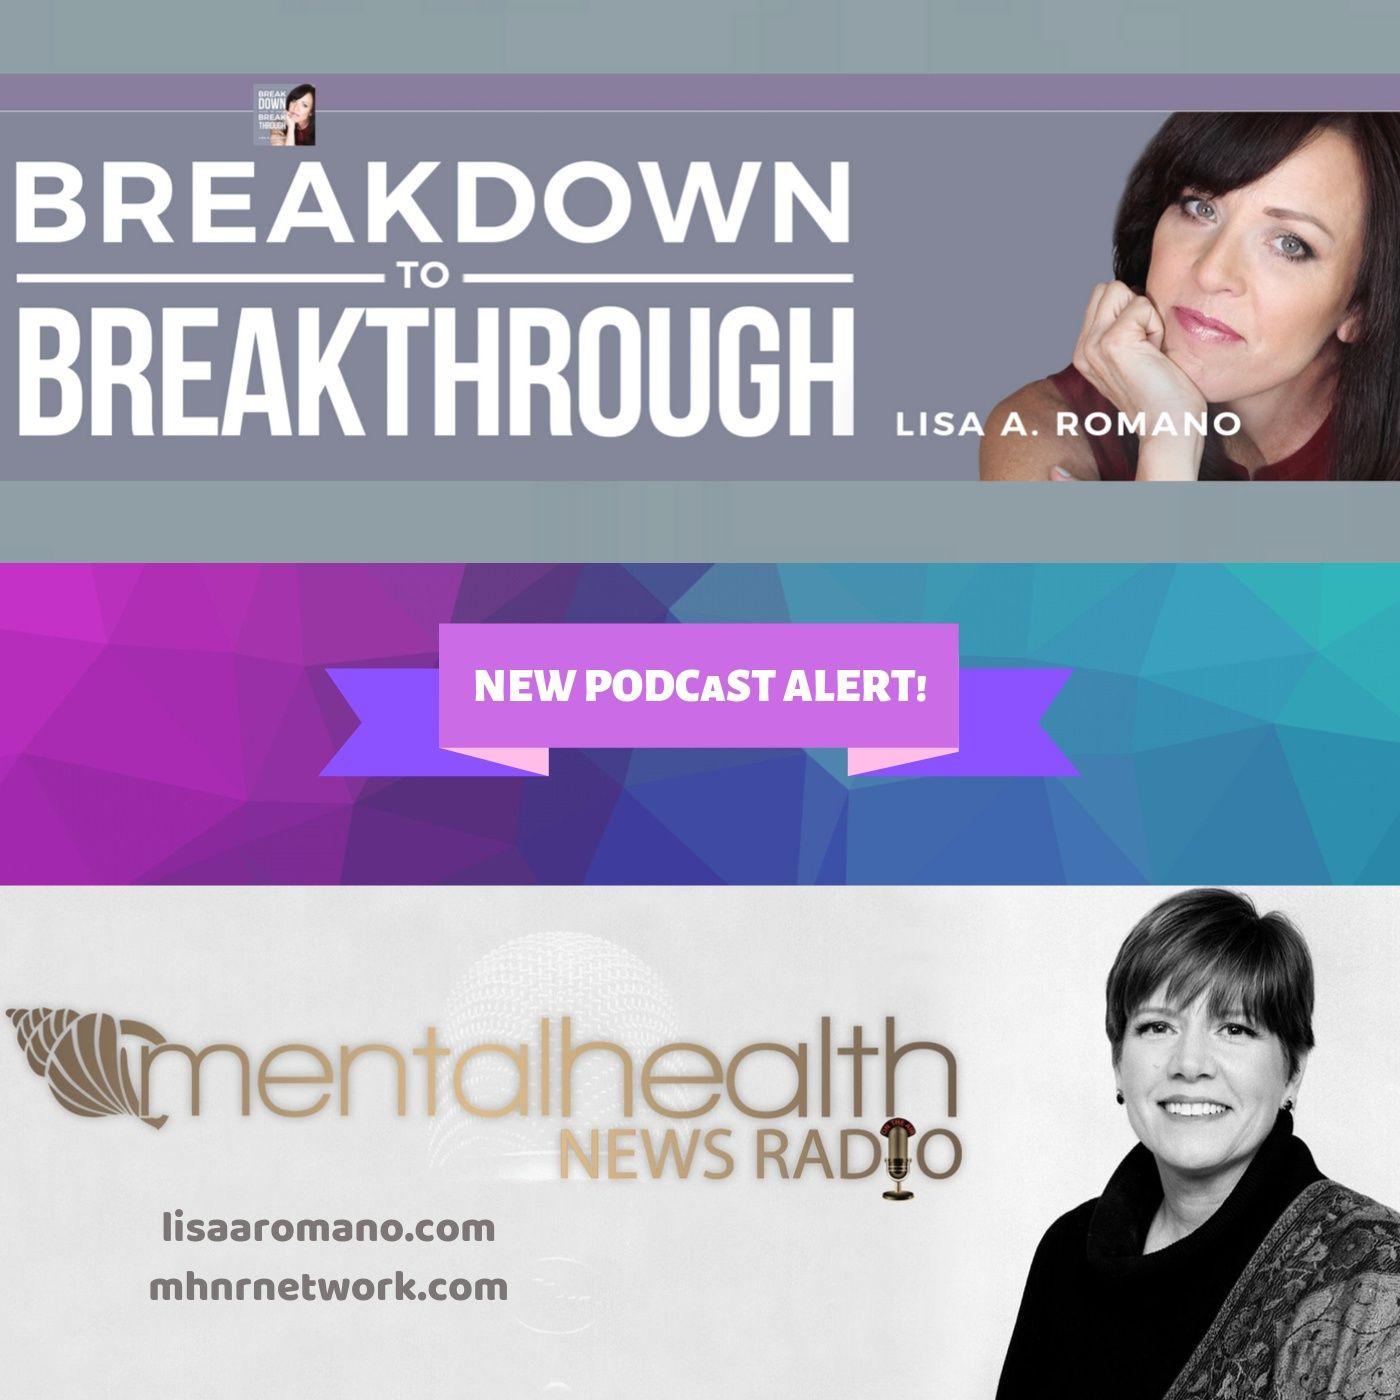 Mental Health News Radio - Breakdown to Breakthrough with Lisa A. Romano